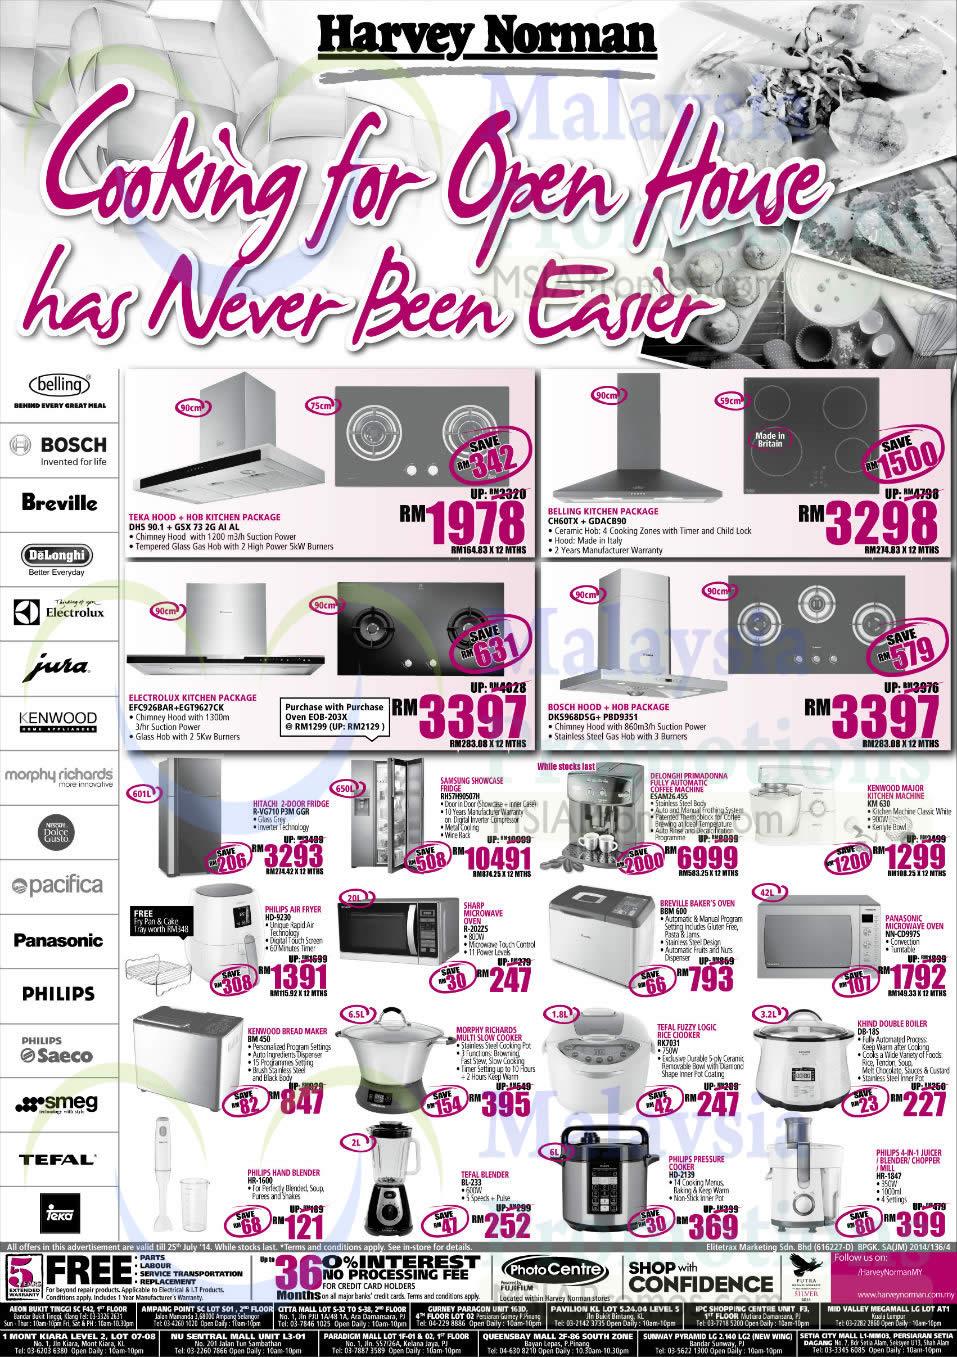 Panasonic Kitchen Appliances Kitchen Appliances Electrolux Bosch Philips Hitachi Panasonic